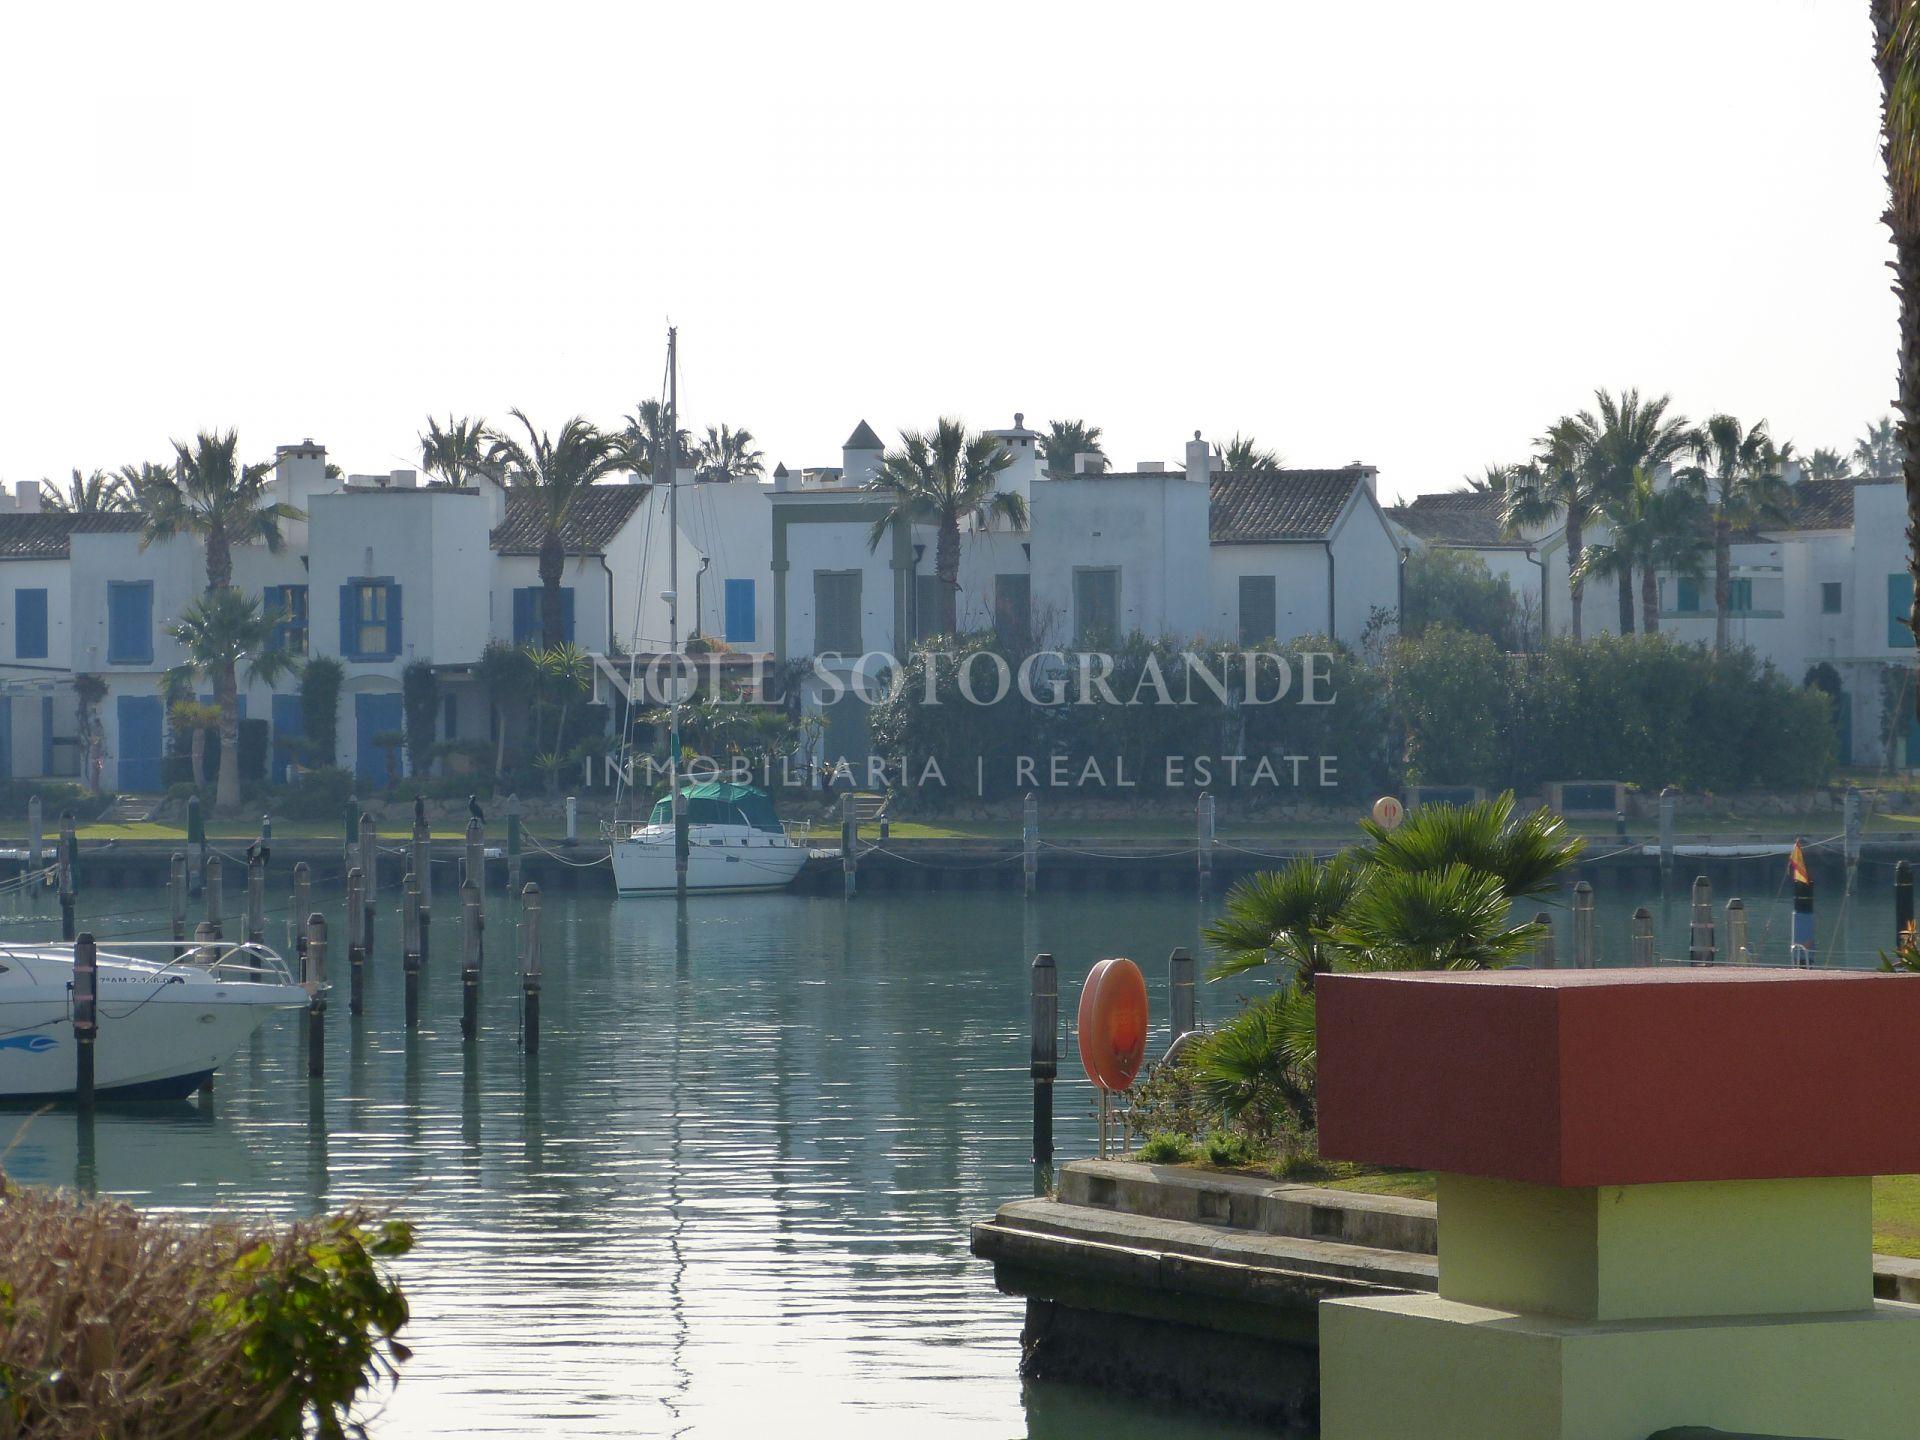 Splendid duplex penthouse Marina Sotogrande Isla Tortuga